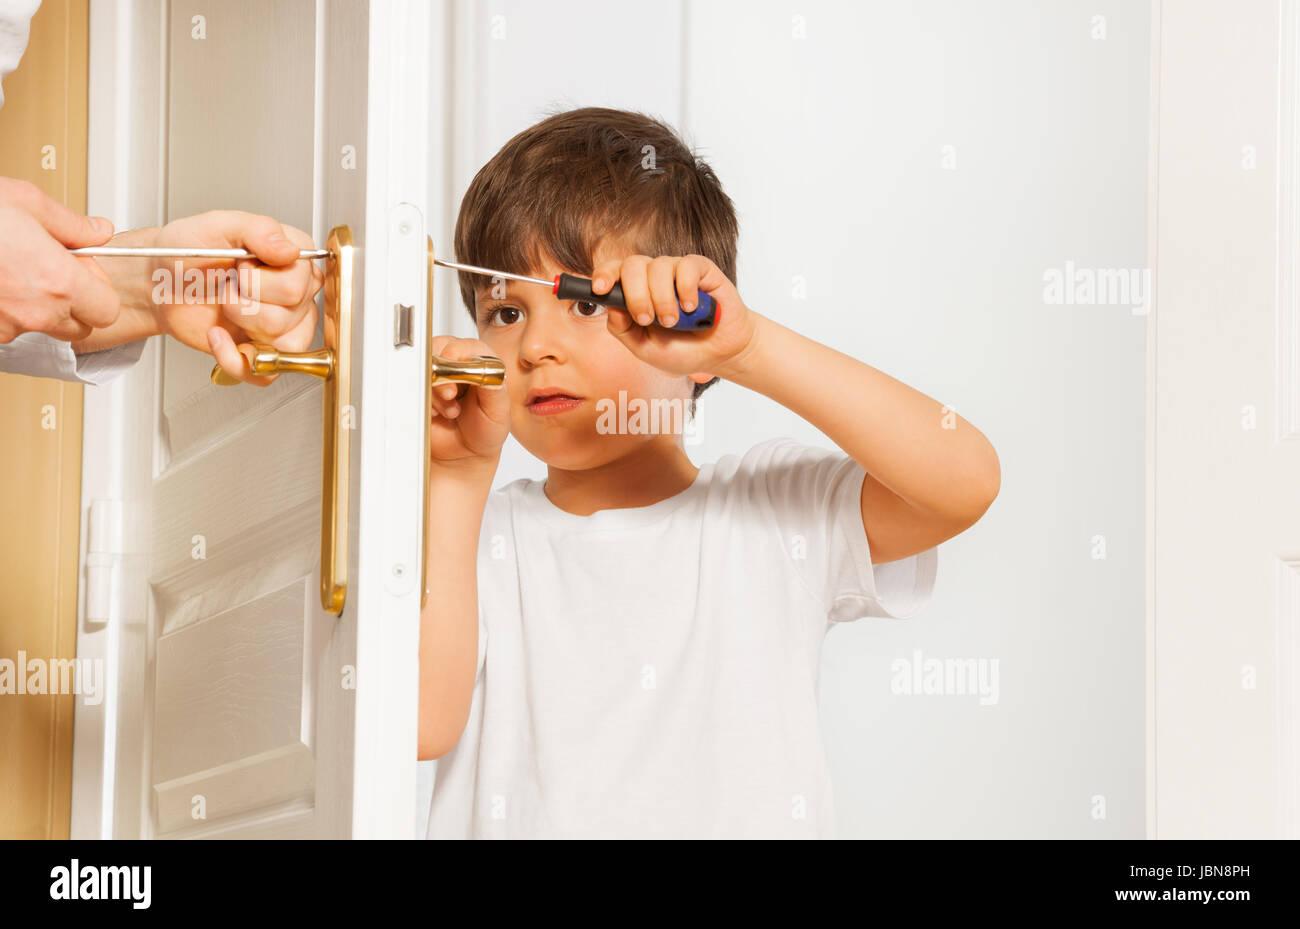 Portrait Of Kid Boy Drawing Up Bolt Of Door Handle Using Screwdriver Stock Photo Alamy